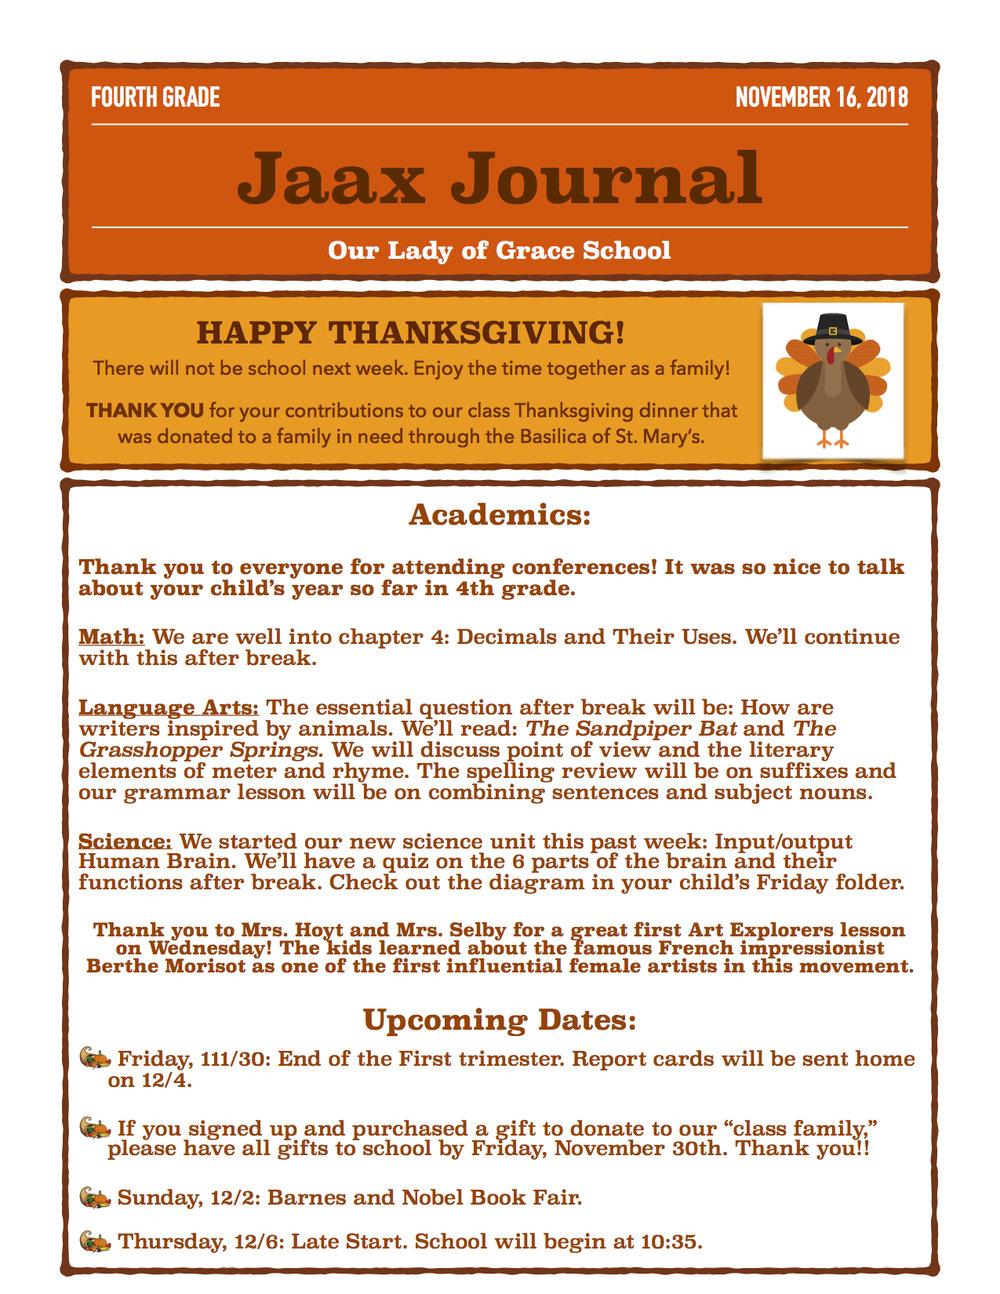 JaaxJournal11-16-18.jpg